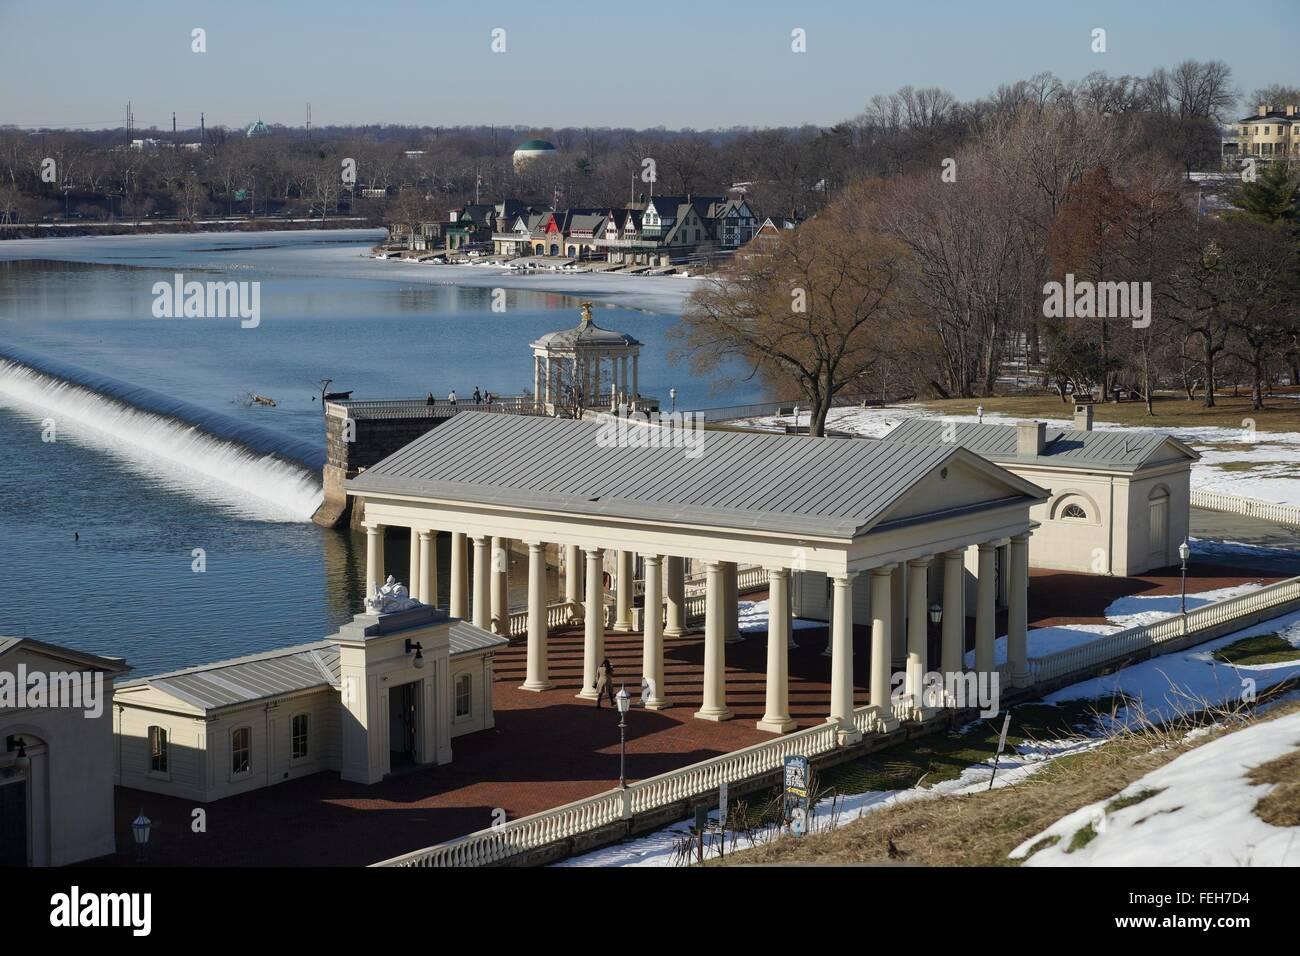 High point view over Fairmount Water Works historical landmark and boathouse row, Philadelphia, USA. - Stock Image